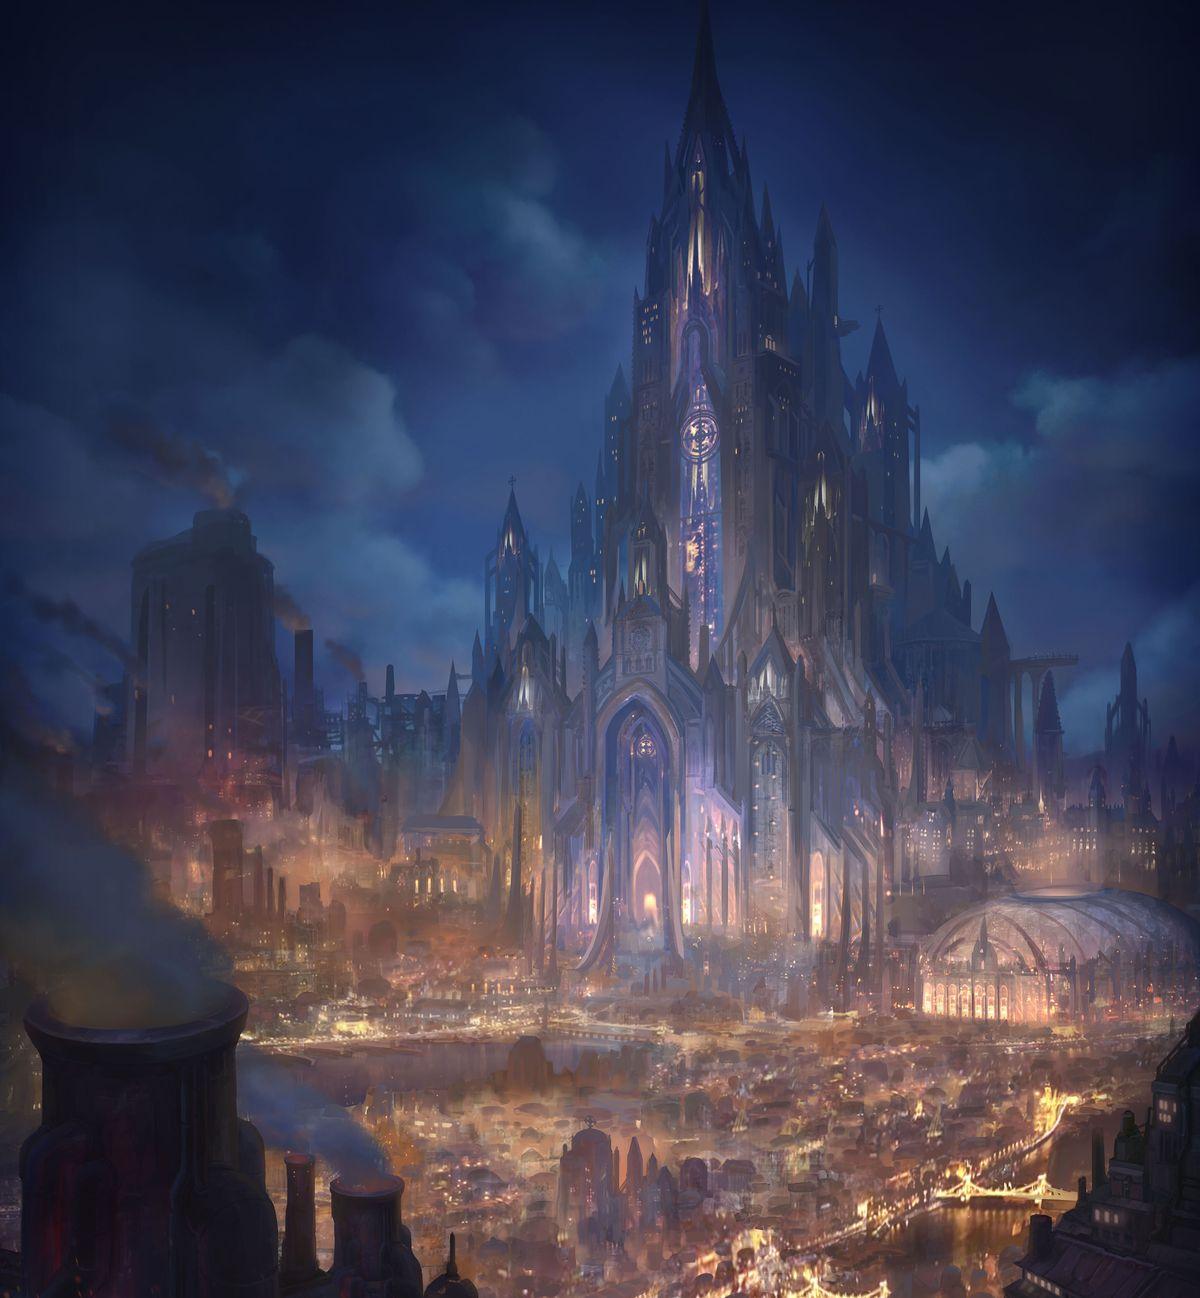 A shining city on a hill, bright lights below.